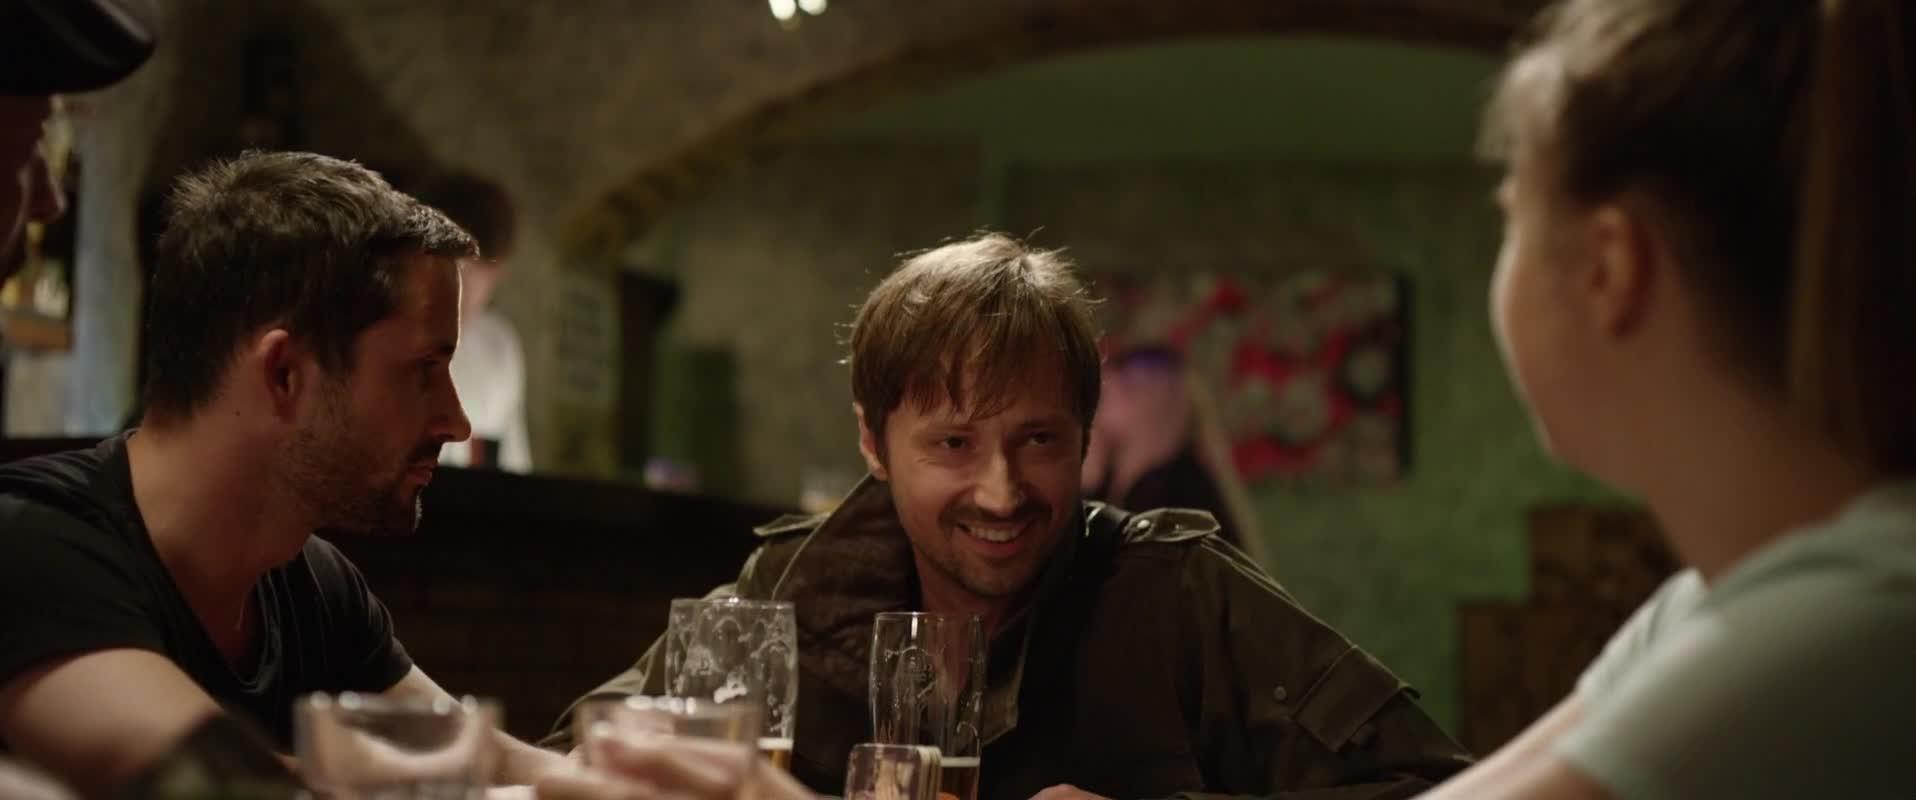 Cena za stesti 2019 CZ film HD